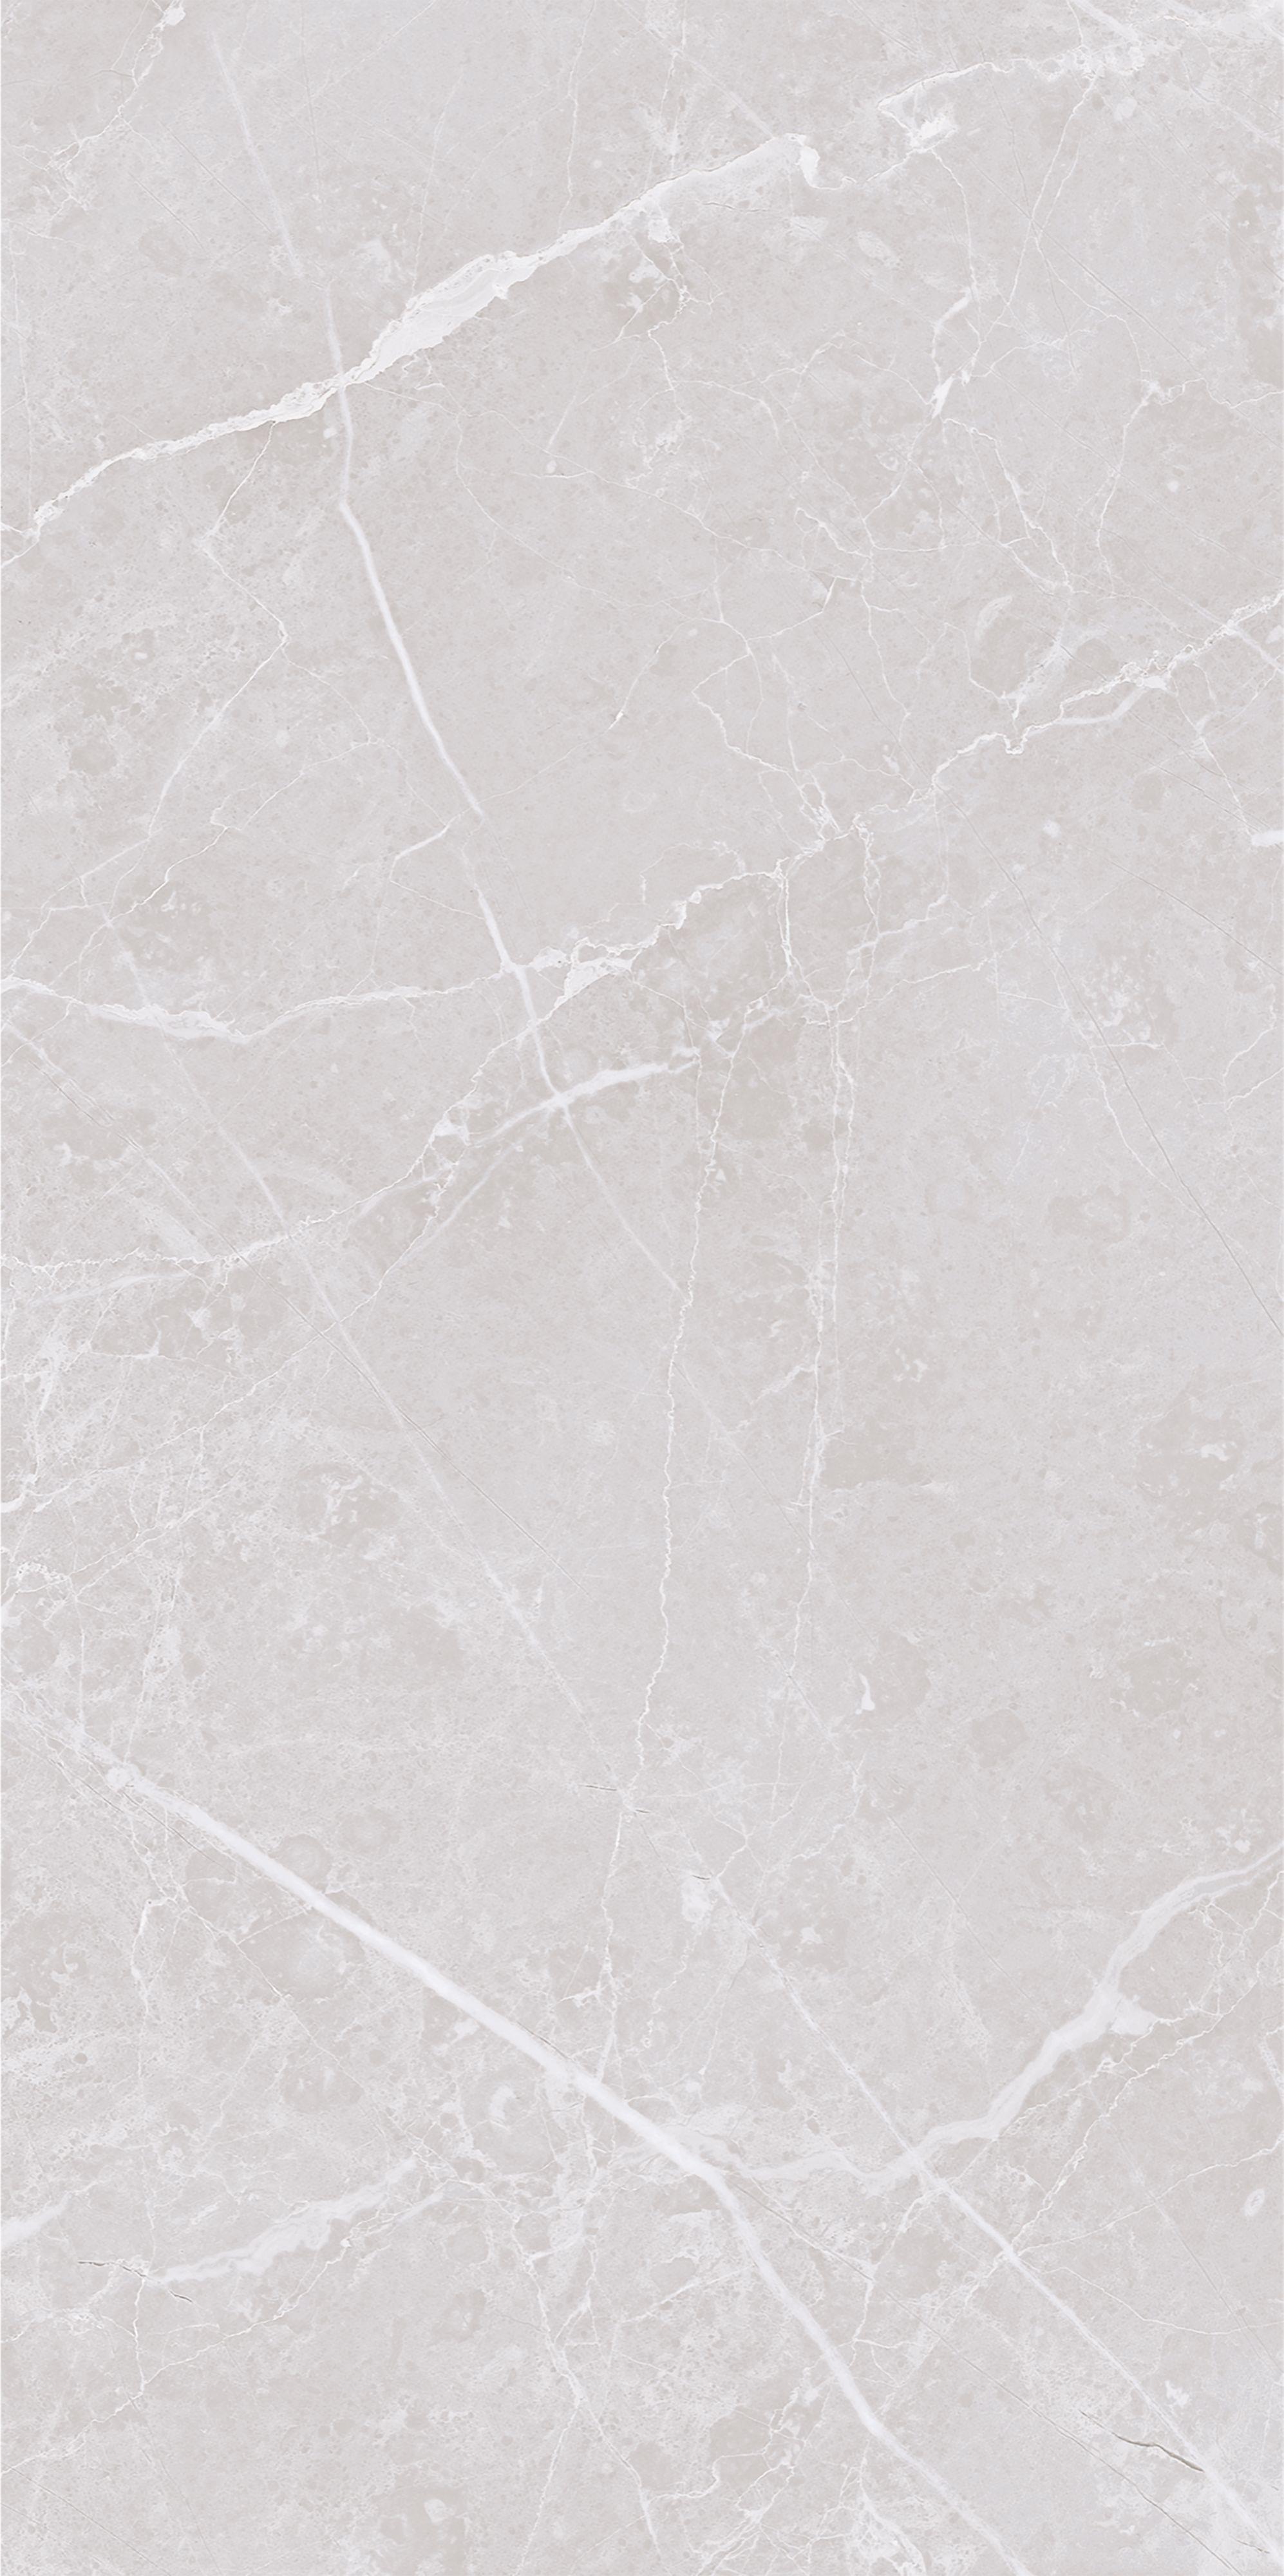 Marmor Marble Crystal Ceramic Tile, Pack of 6, (L)598mm (W)298mm ...